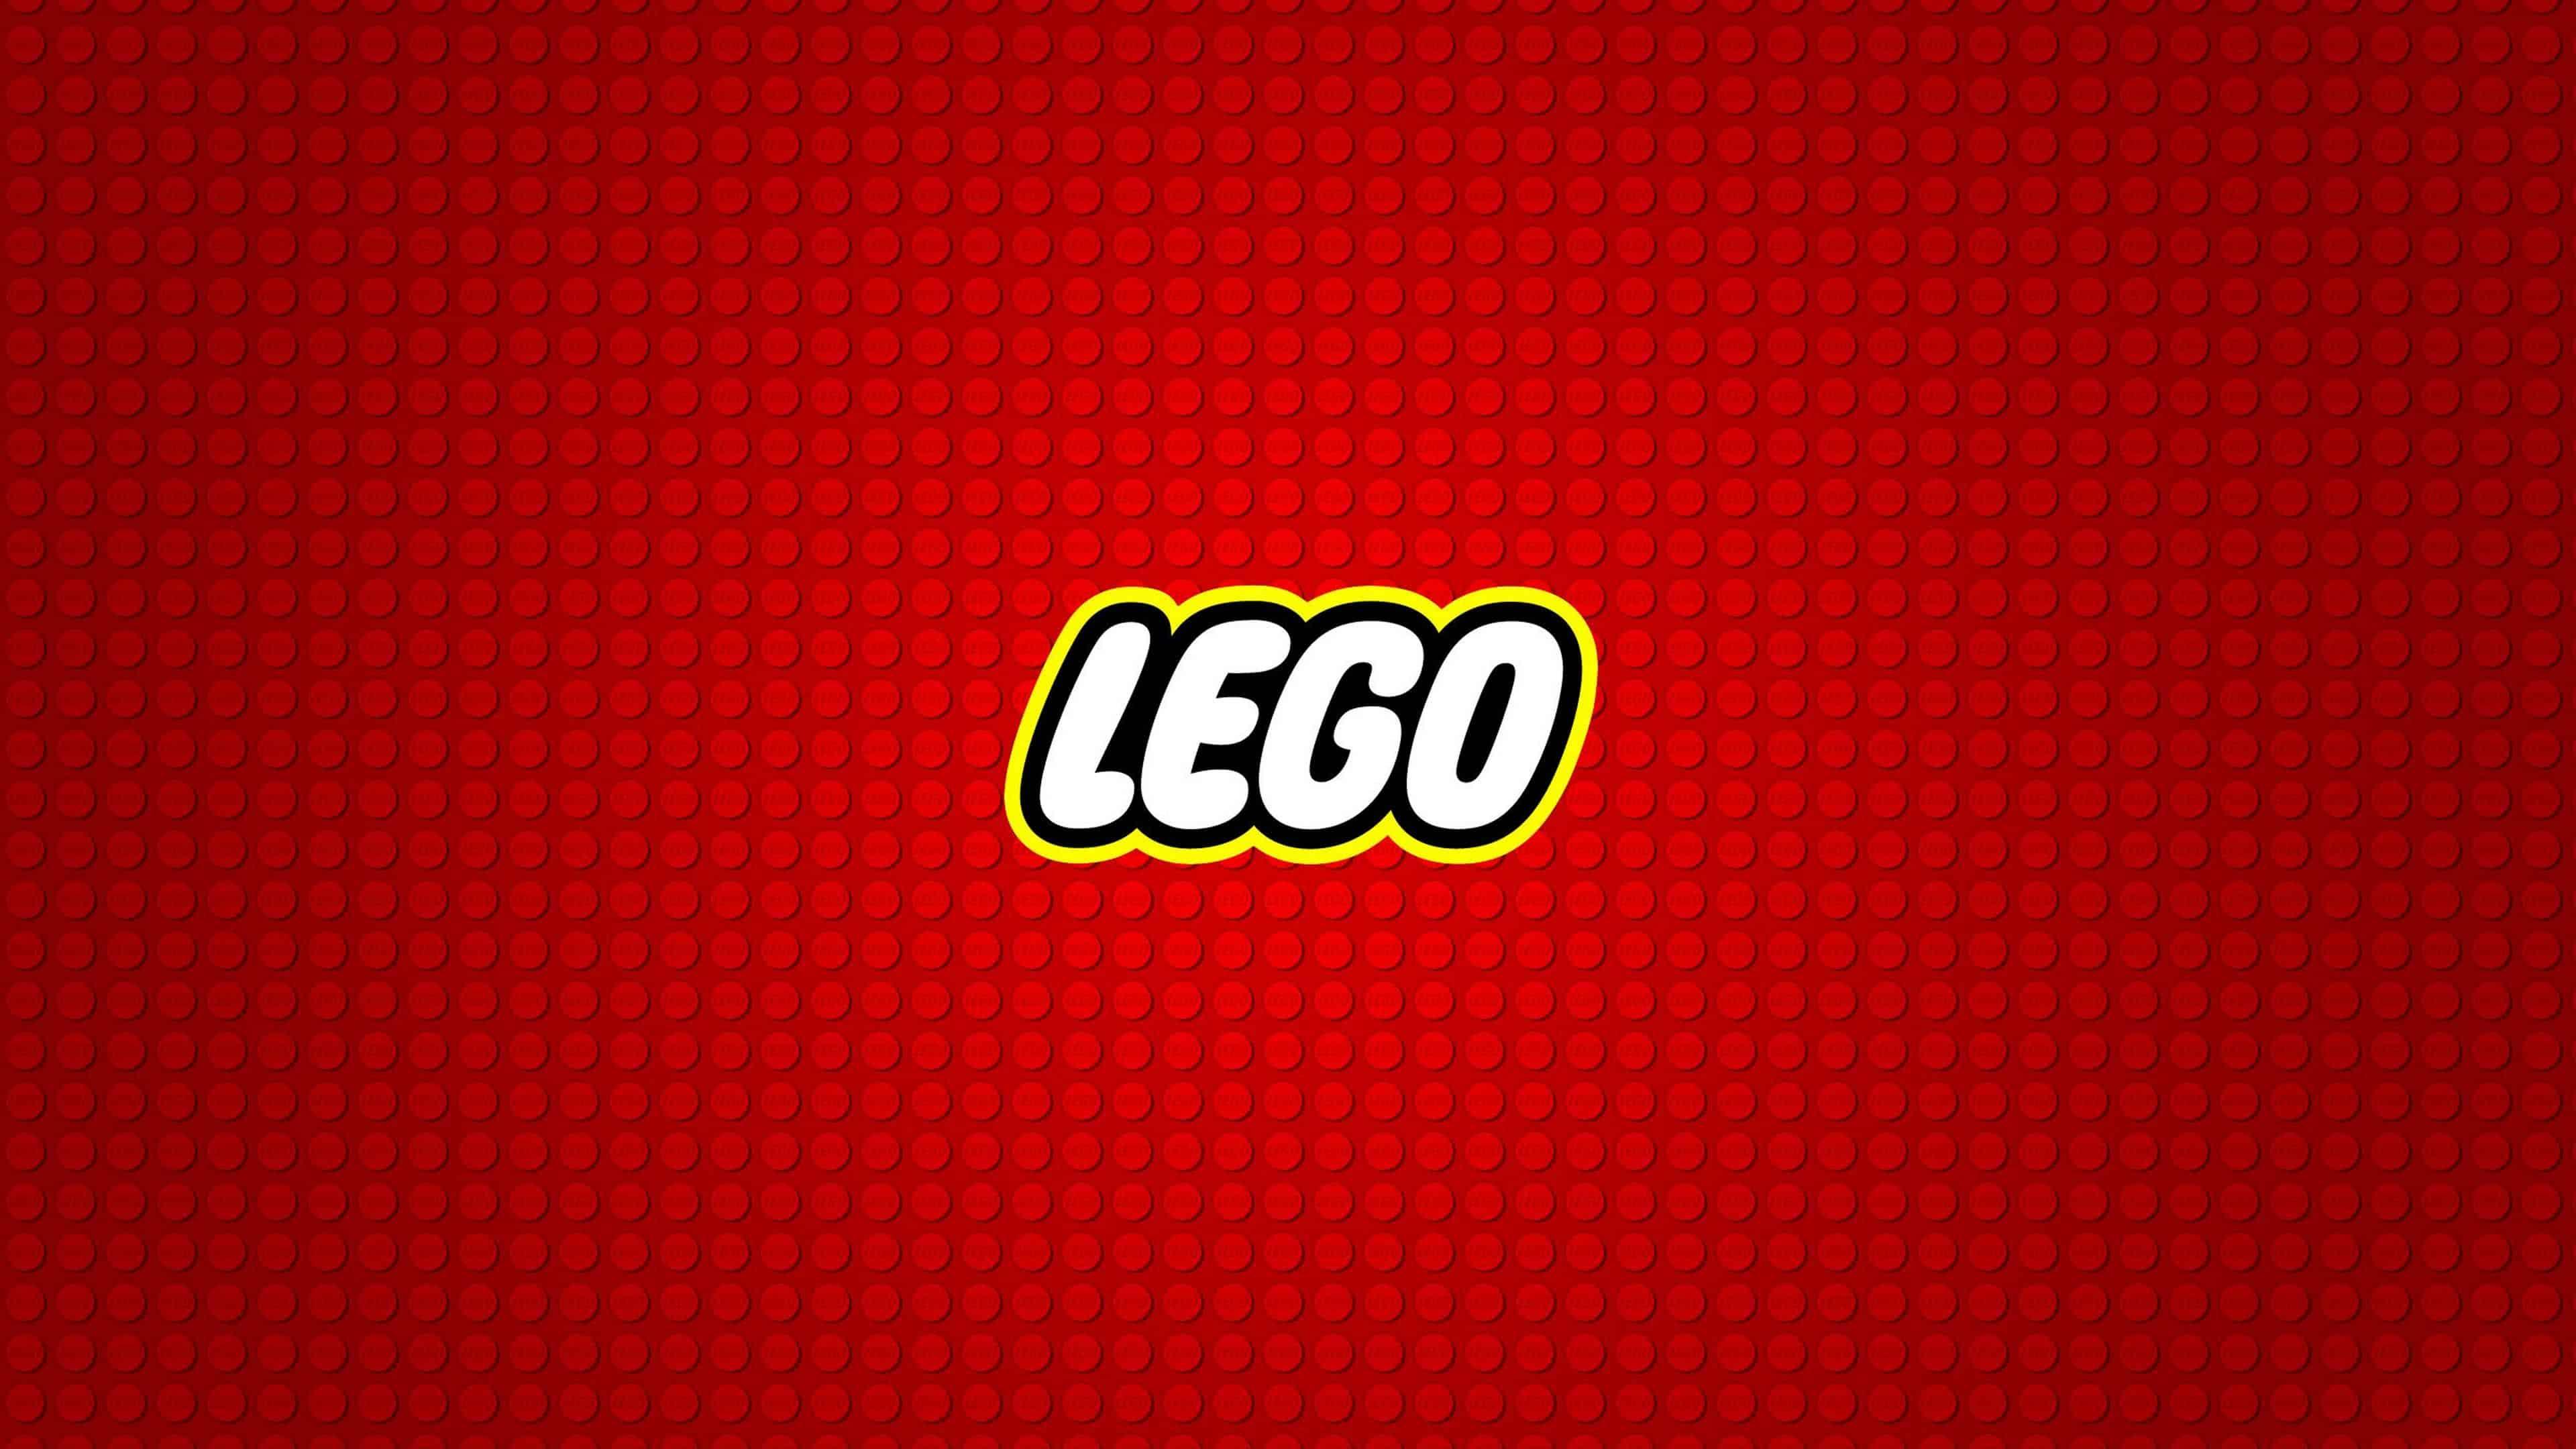 LEGO Logo Red Background UHD 4K Wallpaper Pixelz